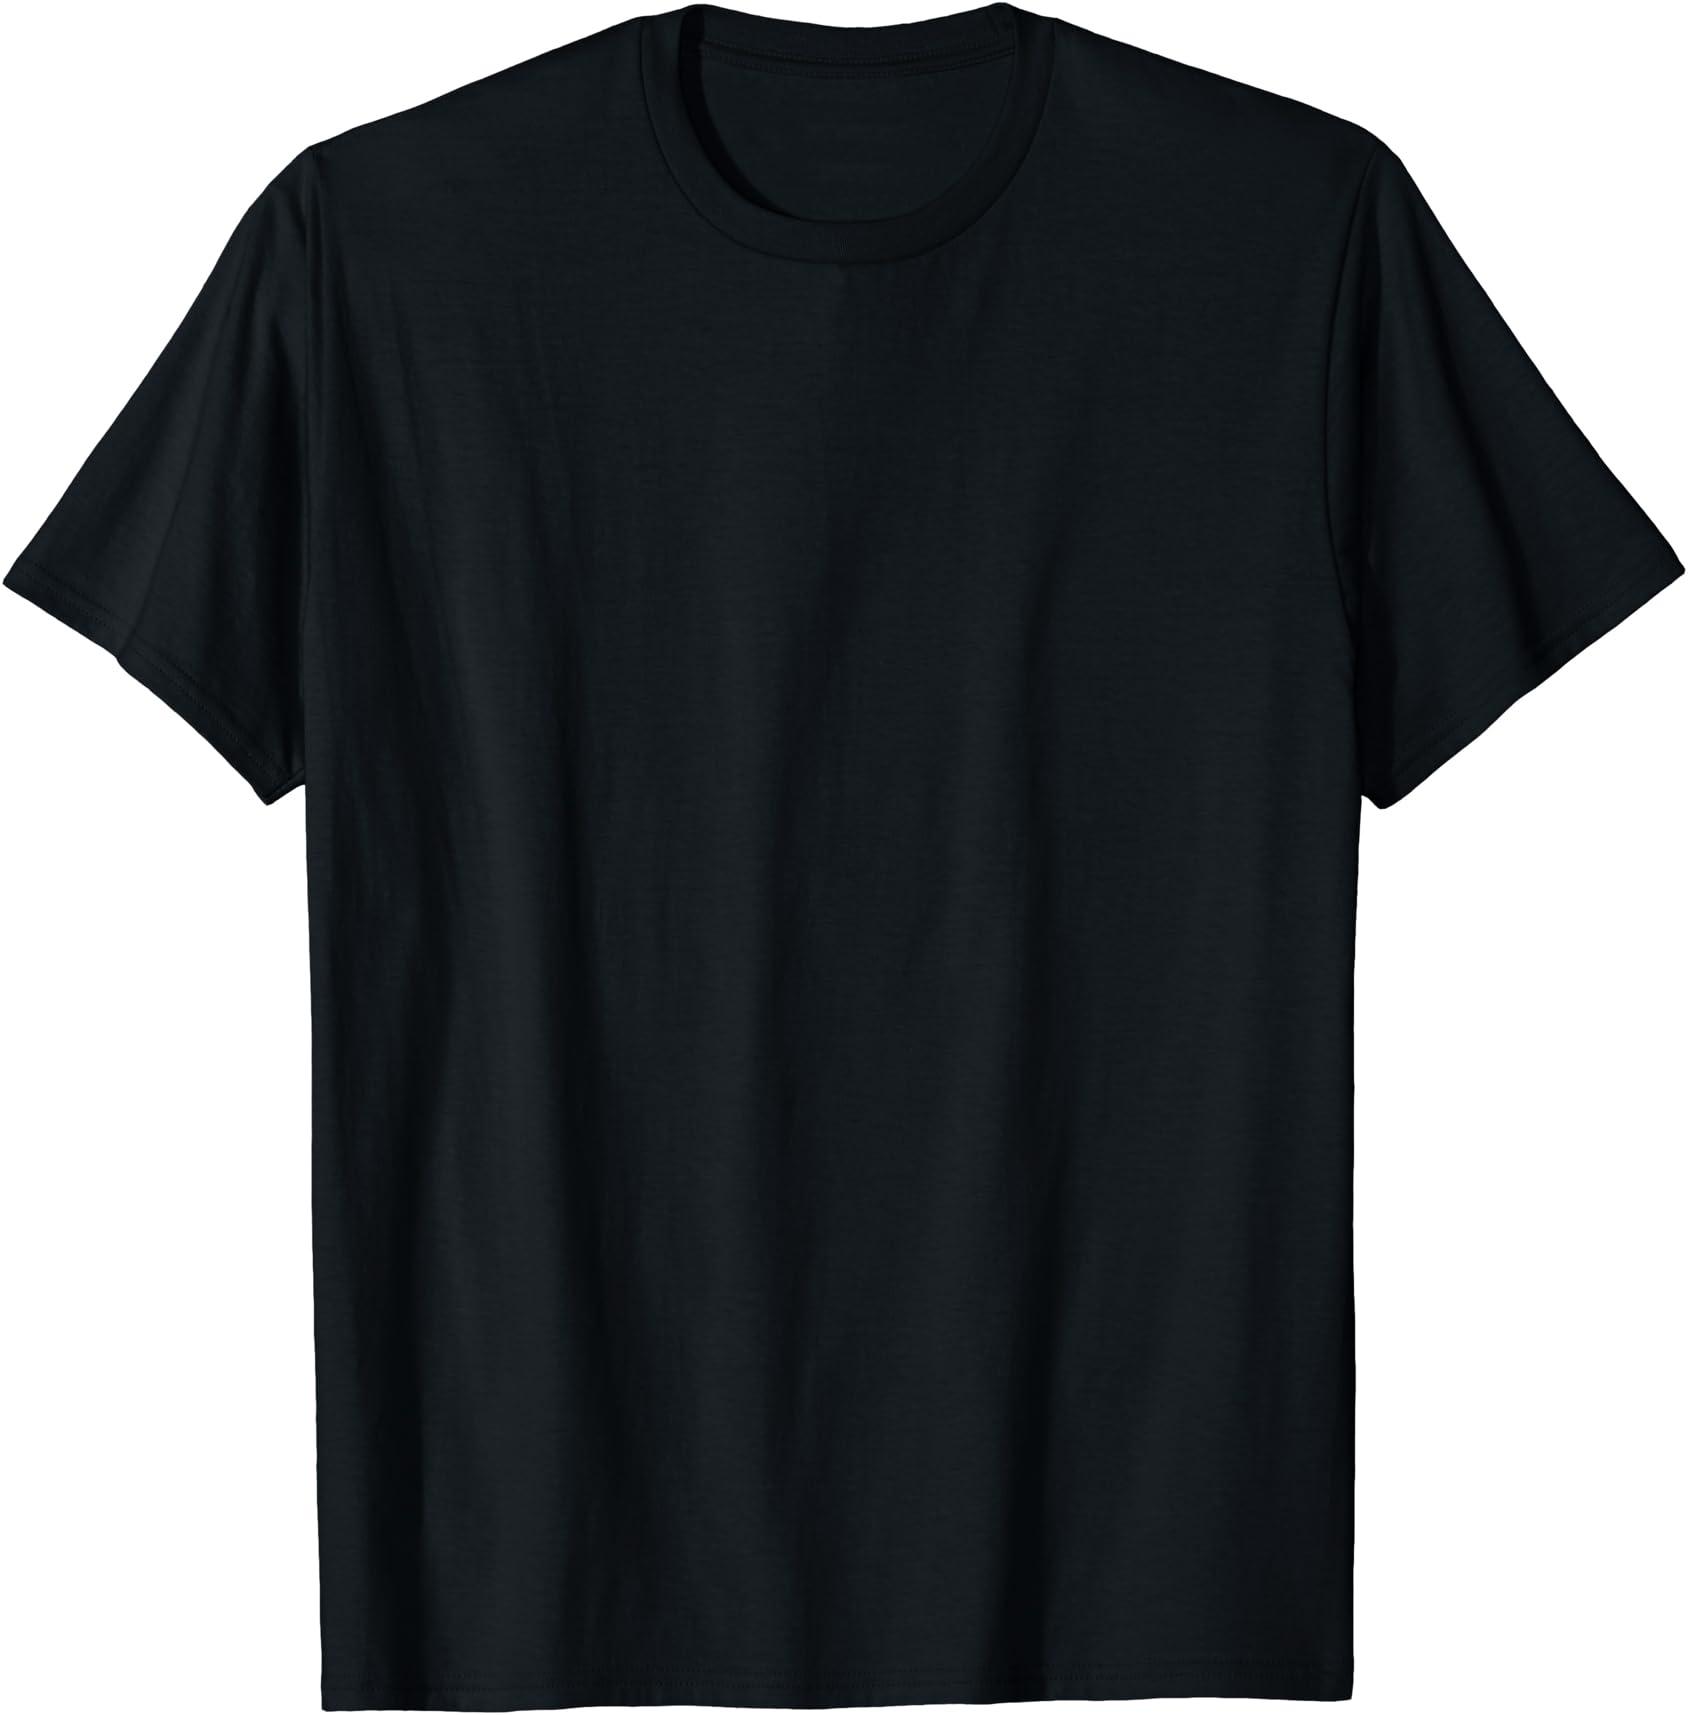 Vinyl Party I Still Call It Deer Creek T-Shirt